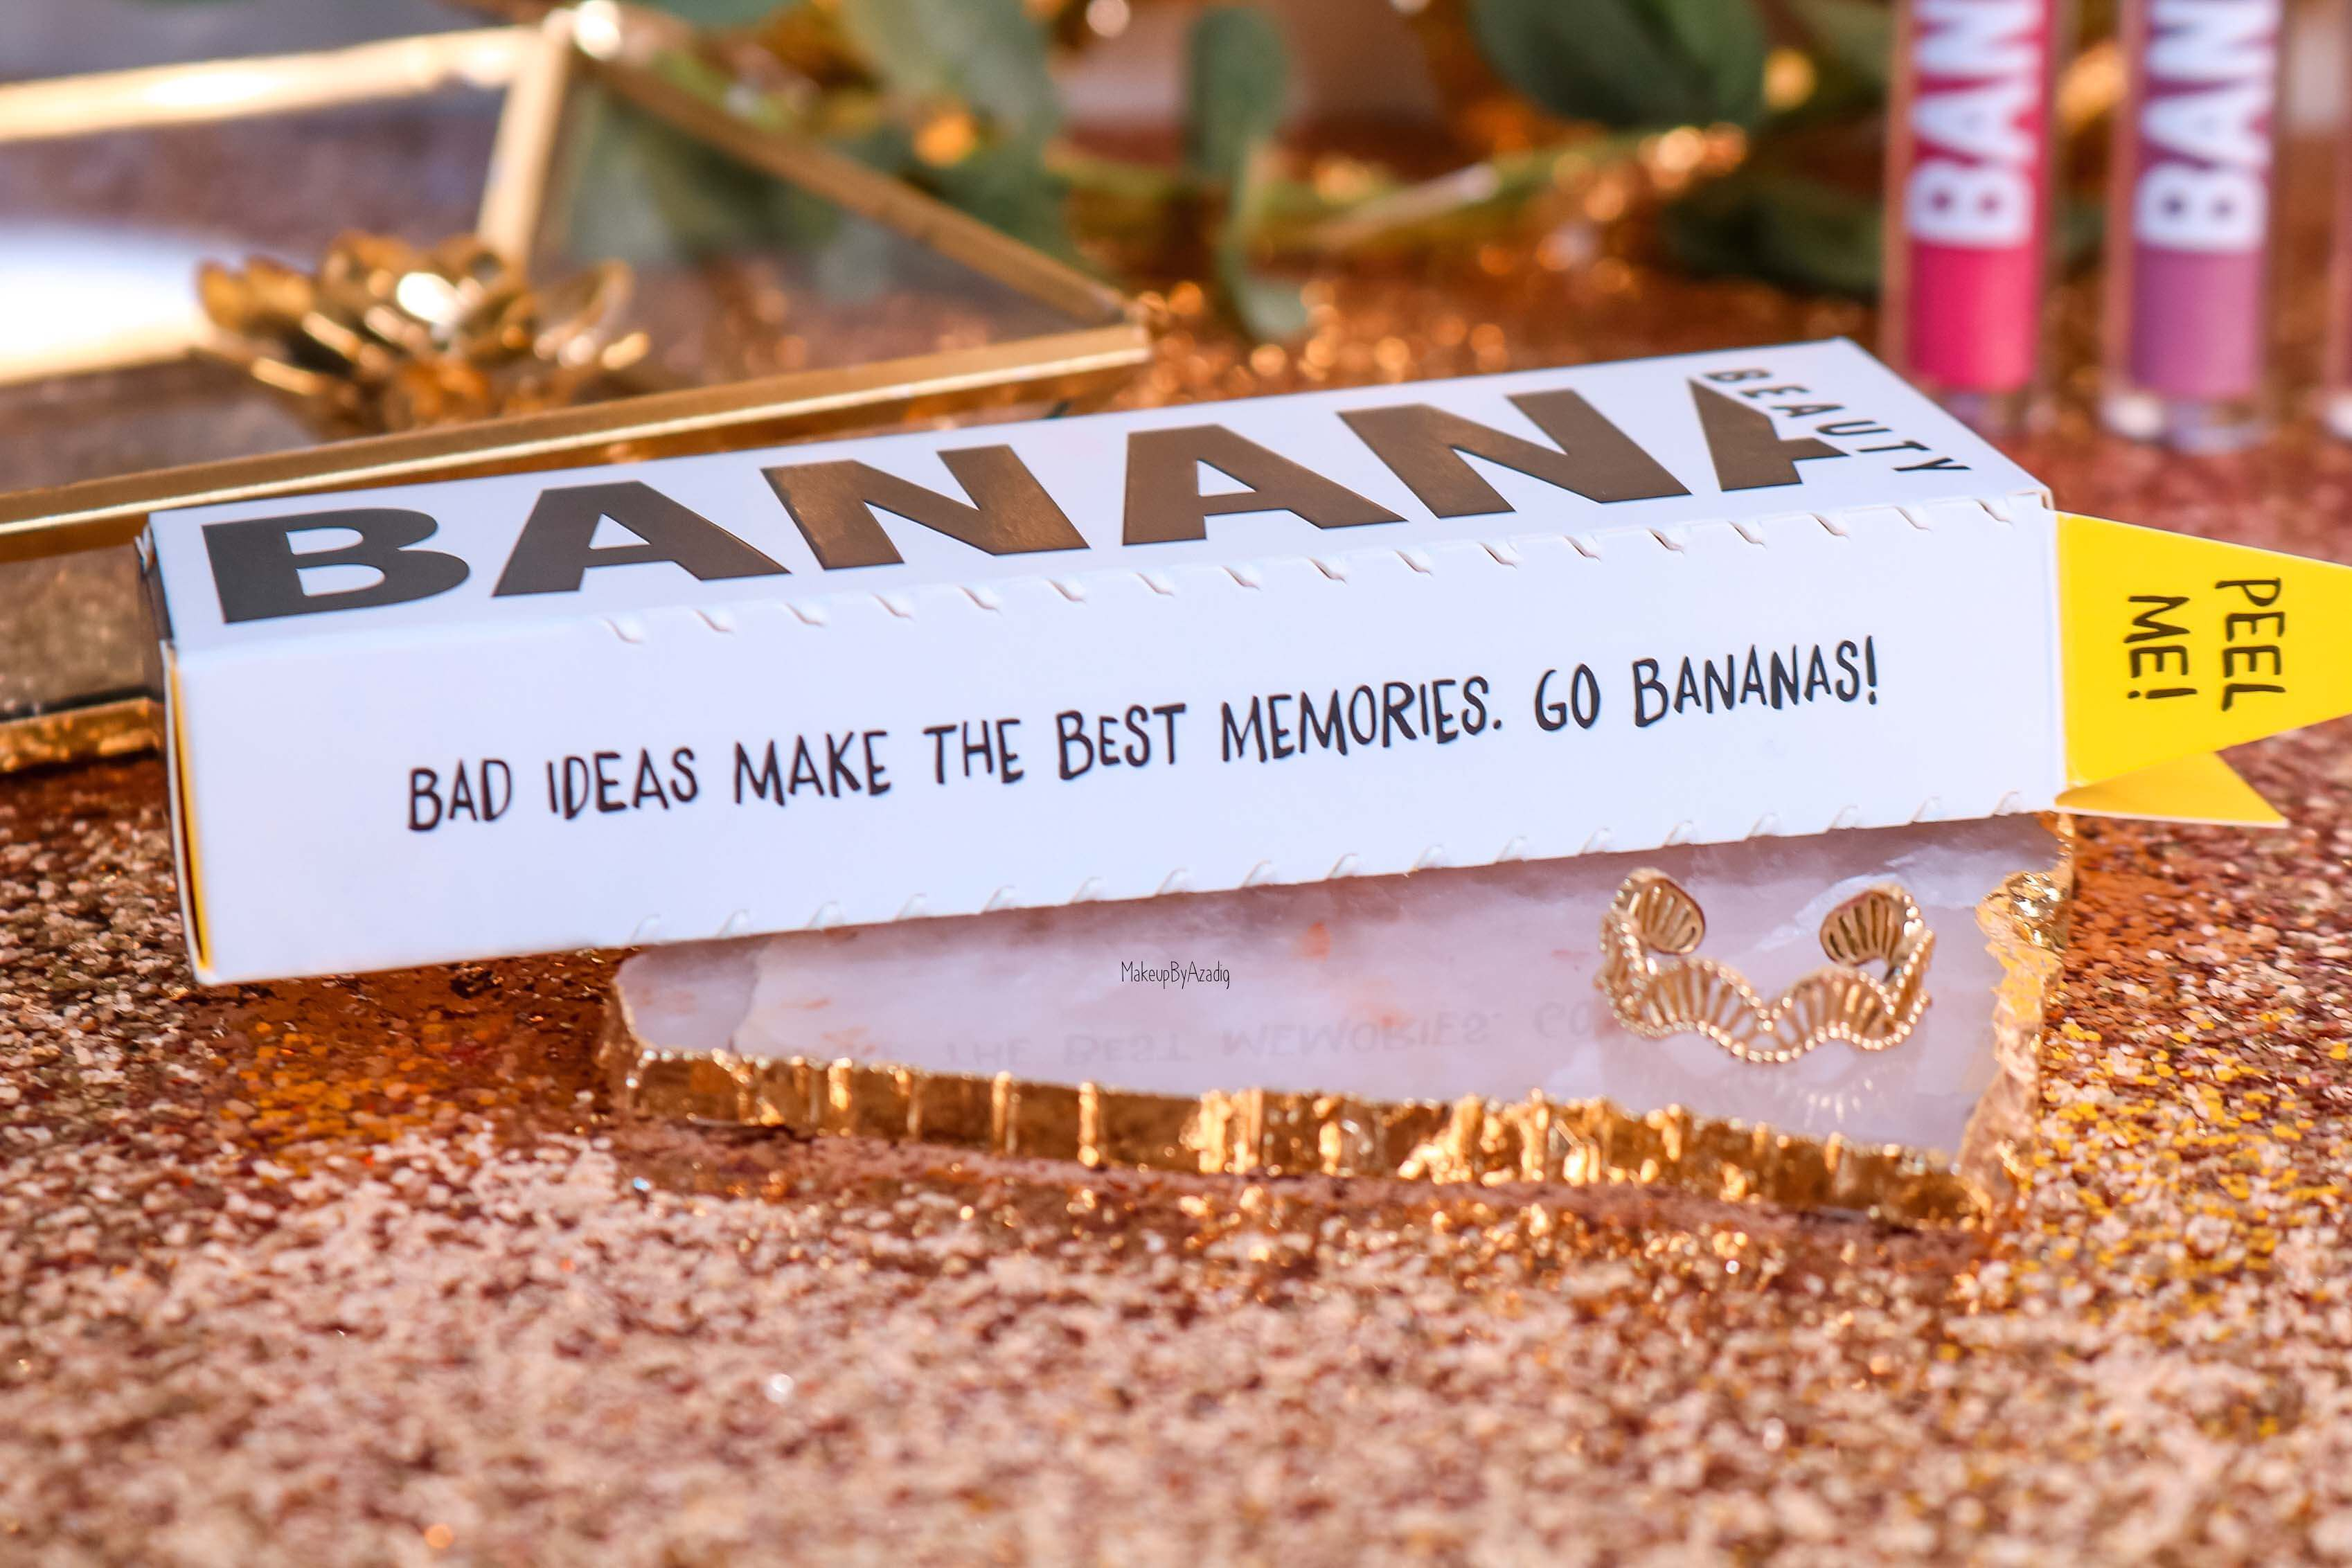 revue-rouge-a-levres-lipstick-banana-beauty-avis-prix-swatch-partenariat-ohlalicious-lady-licious-heels-up-makeupbyazadig-nude-collector-code-promo-best